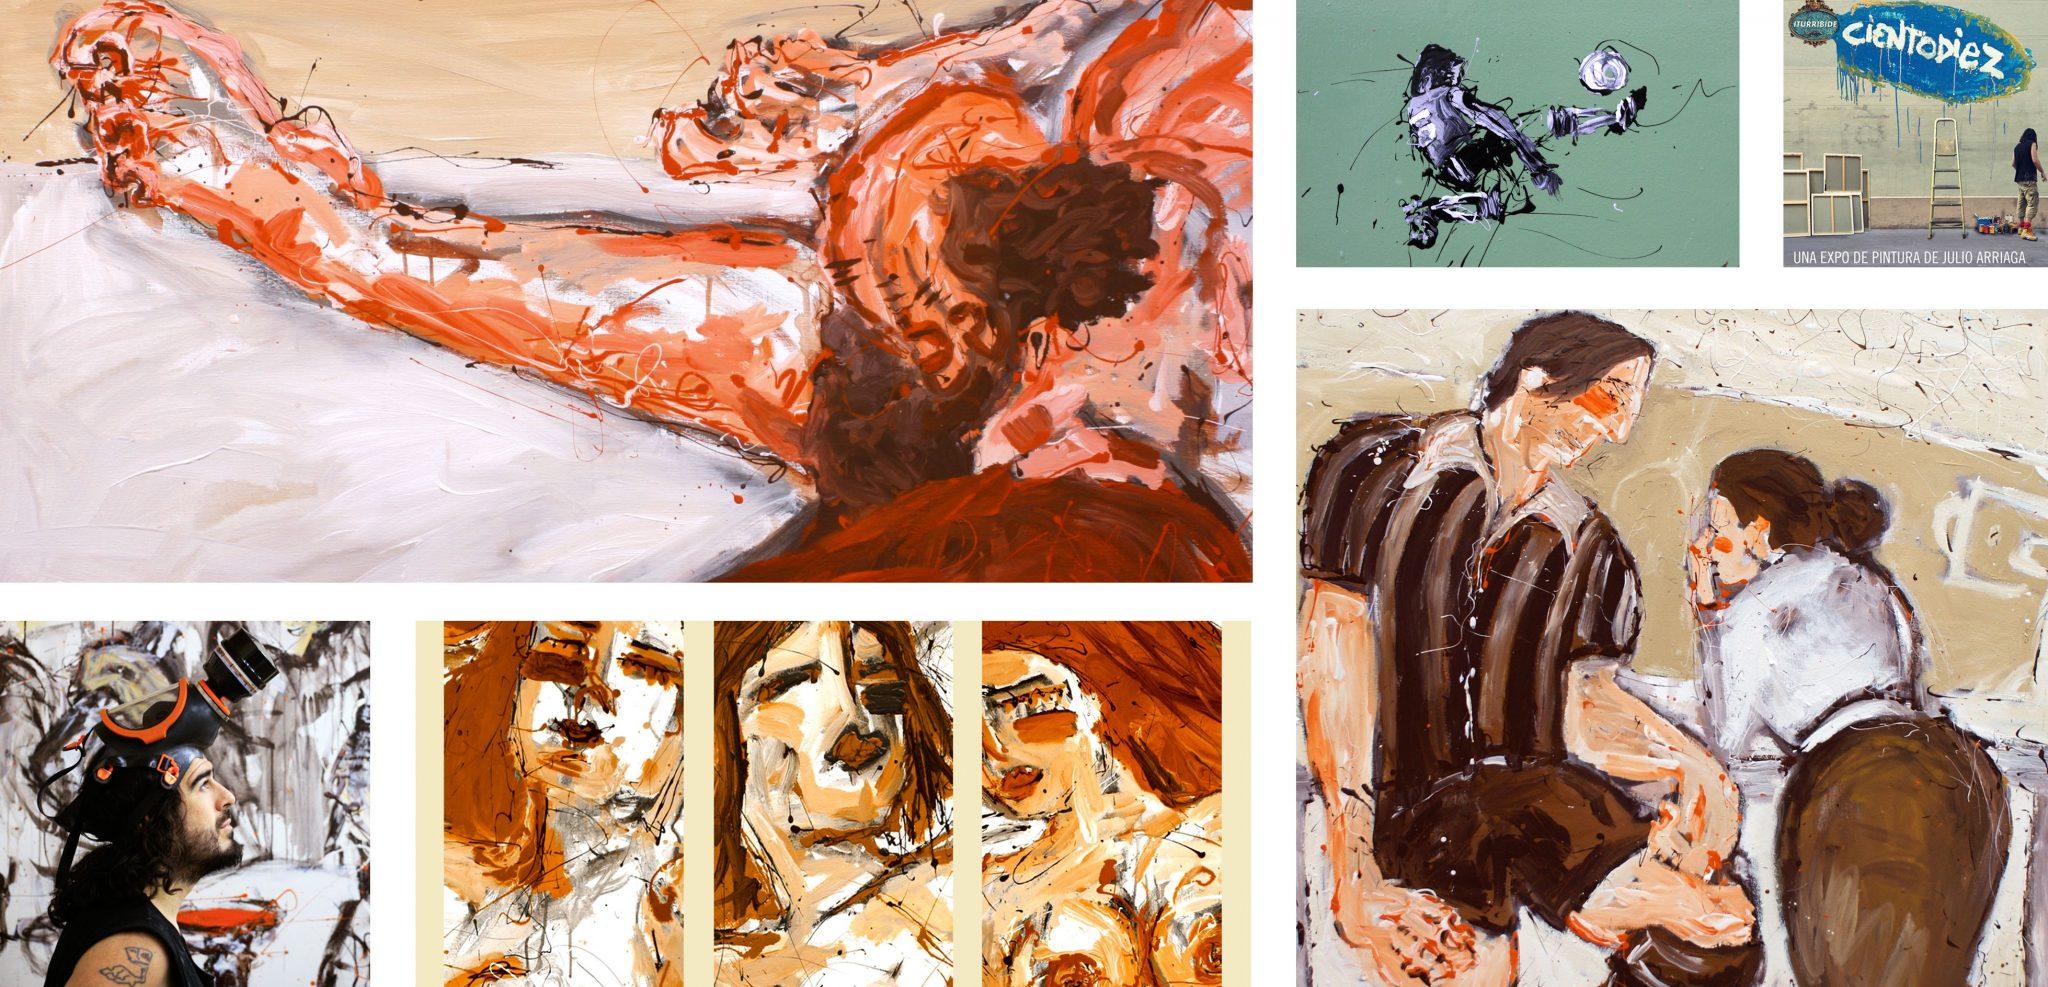 Julio Arriaga, Elartixta xtudio pintura julio arriaga elartixta auxmagazine arte